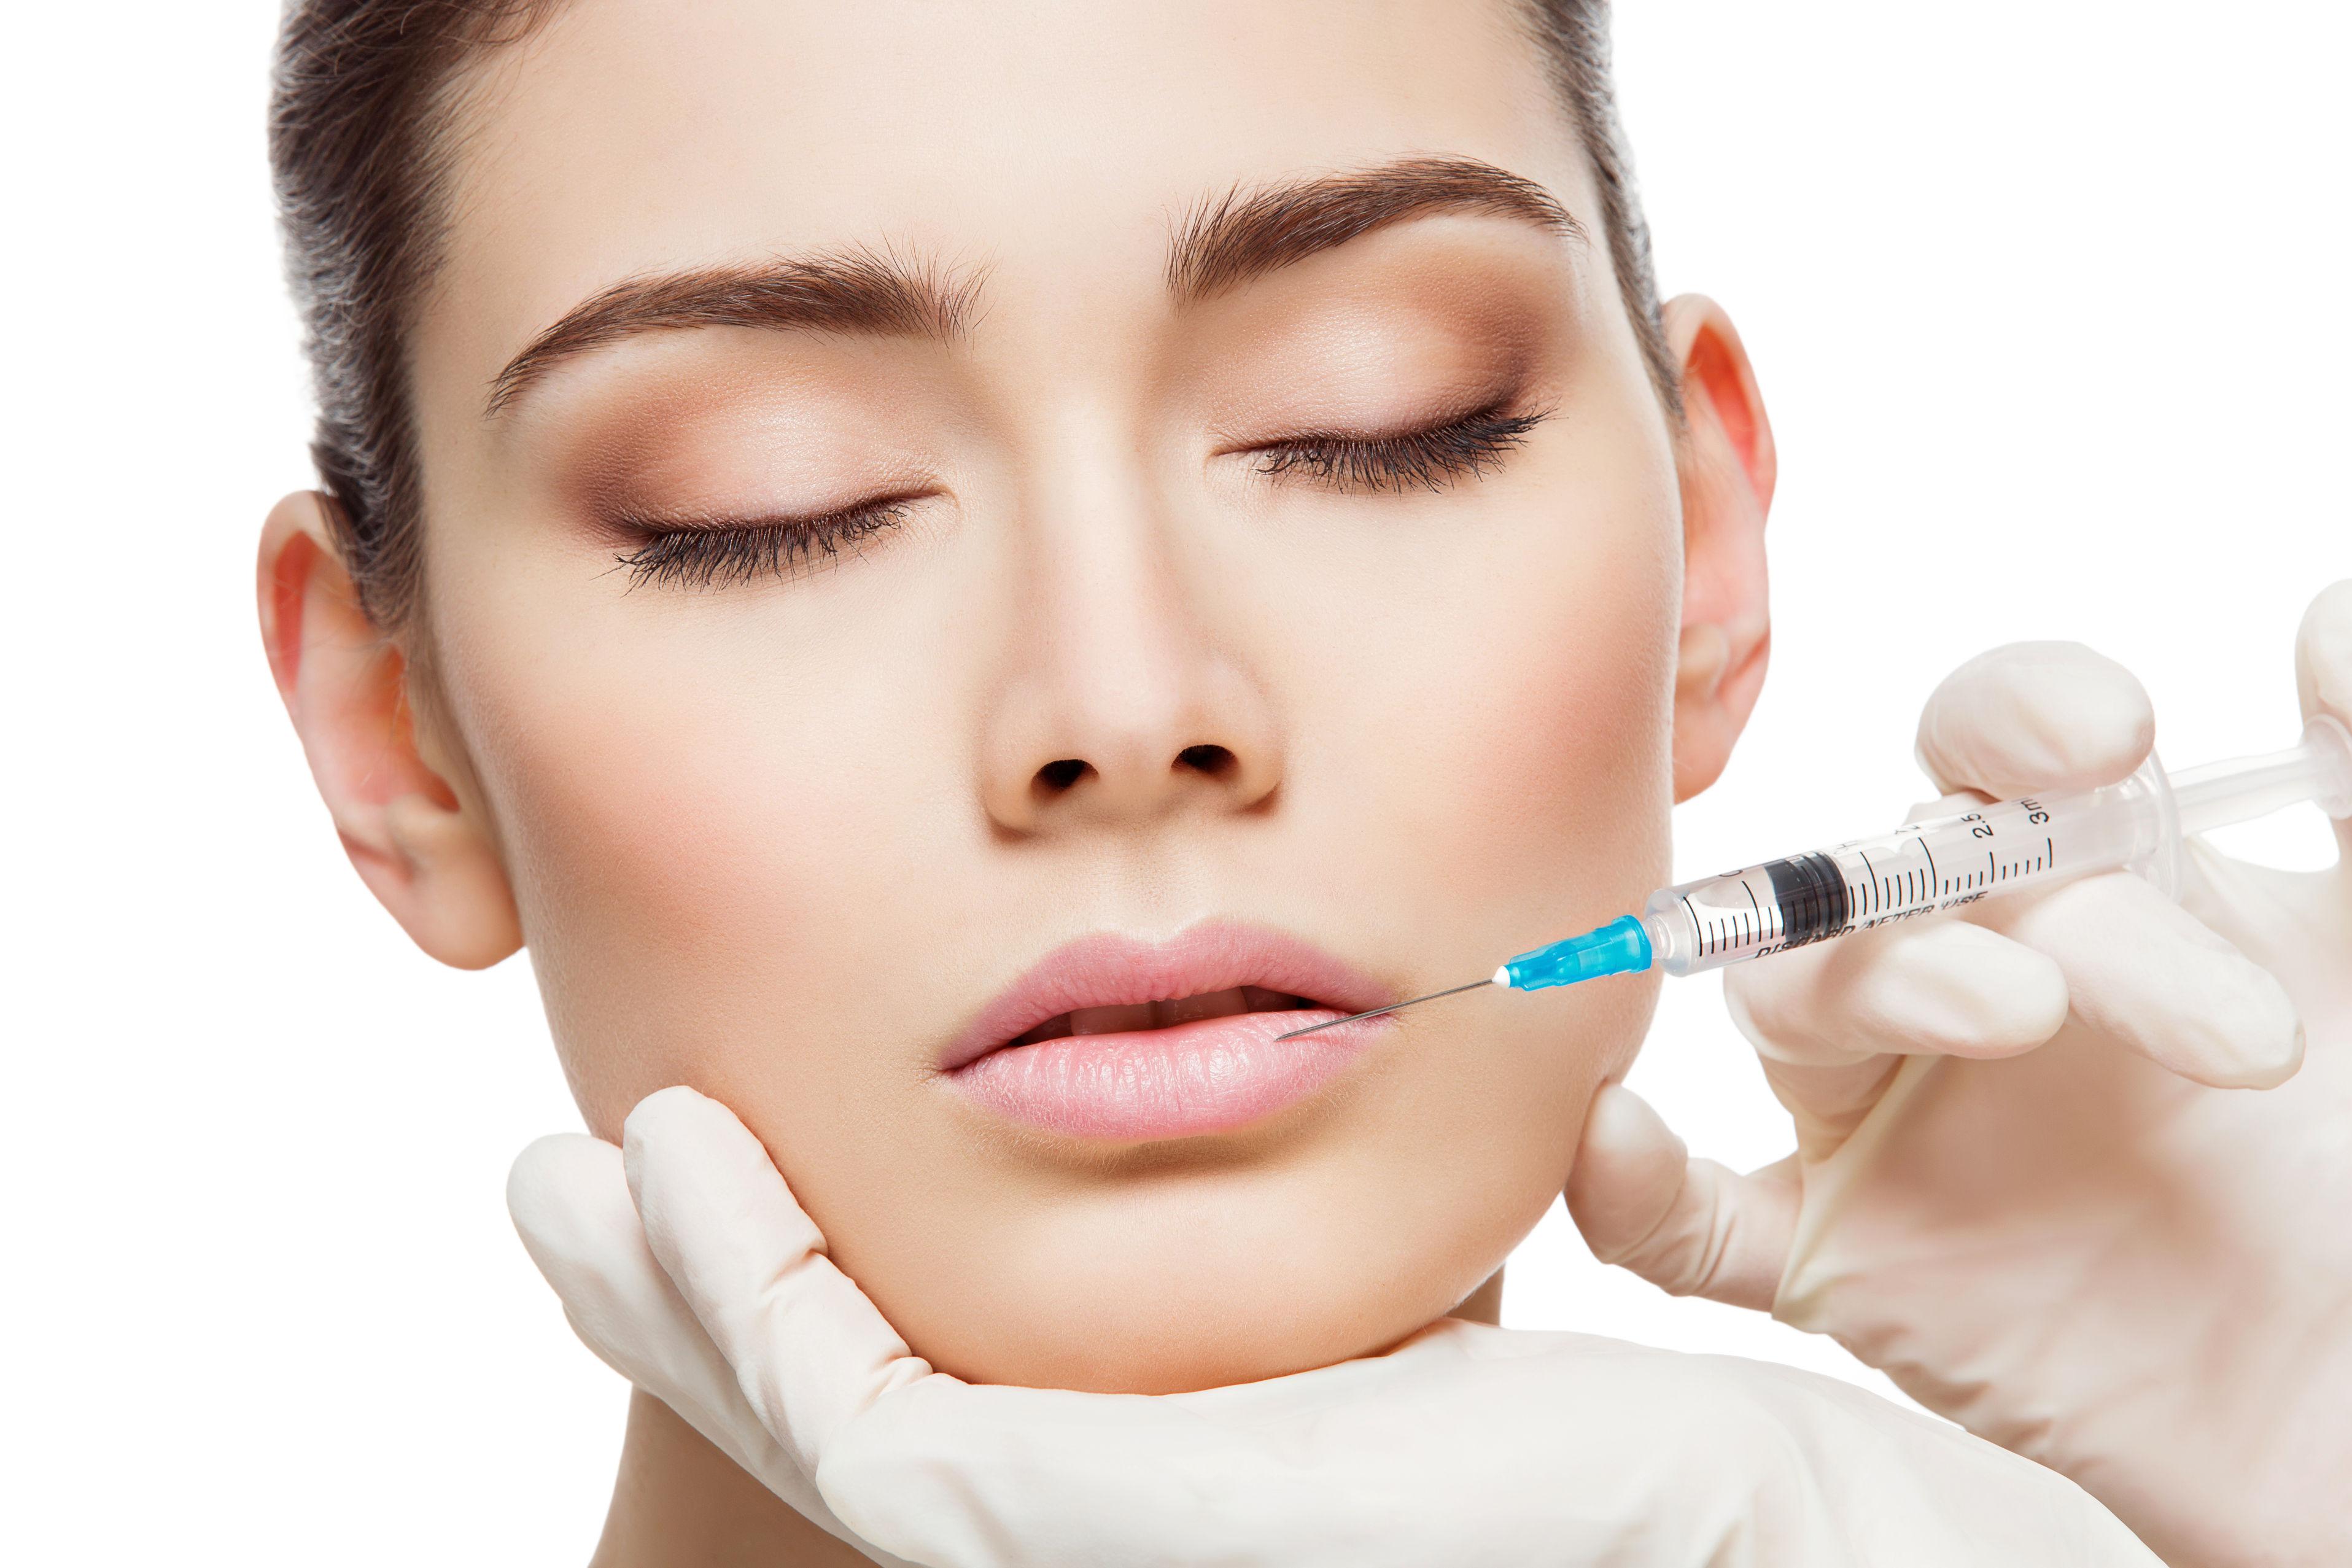 facial-plastic-surgery-clinics-jensen